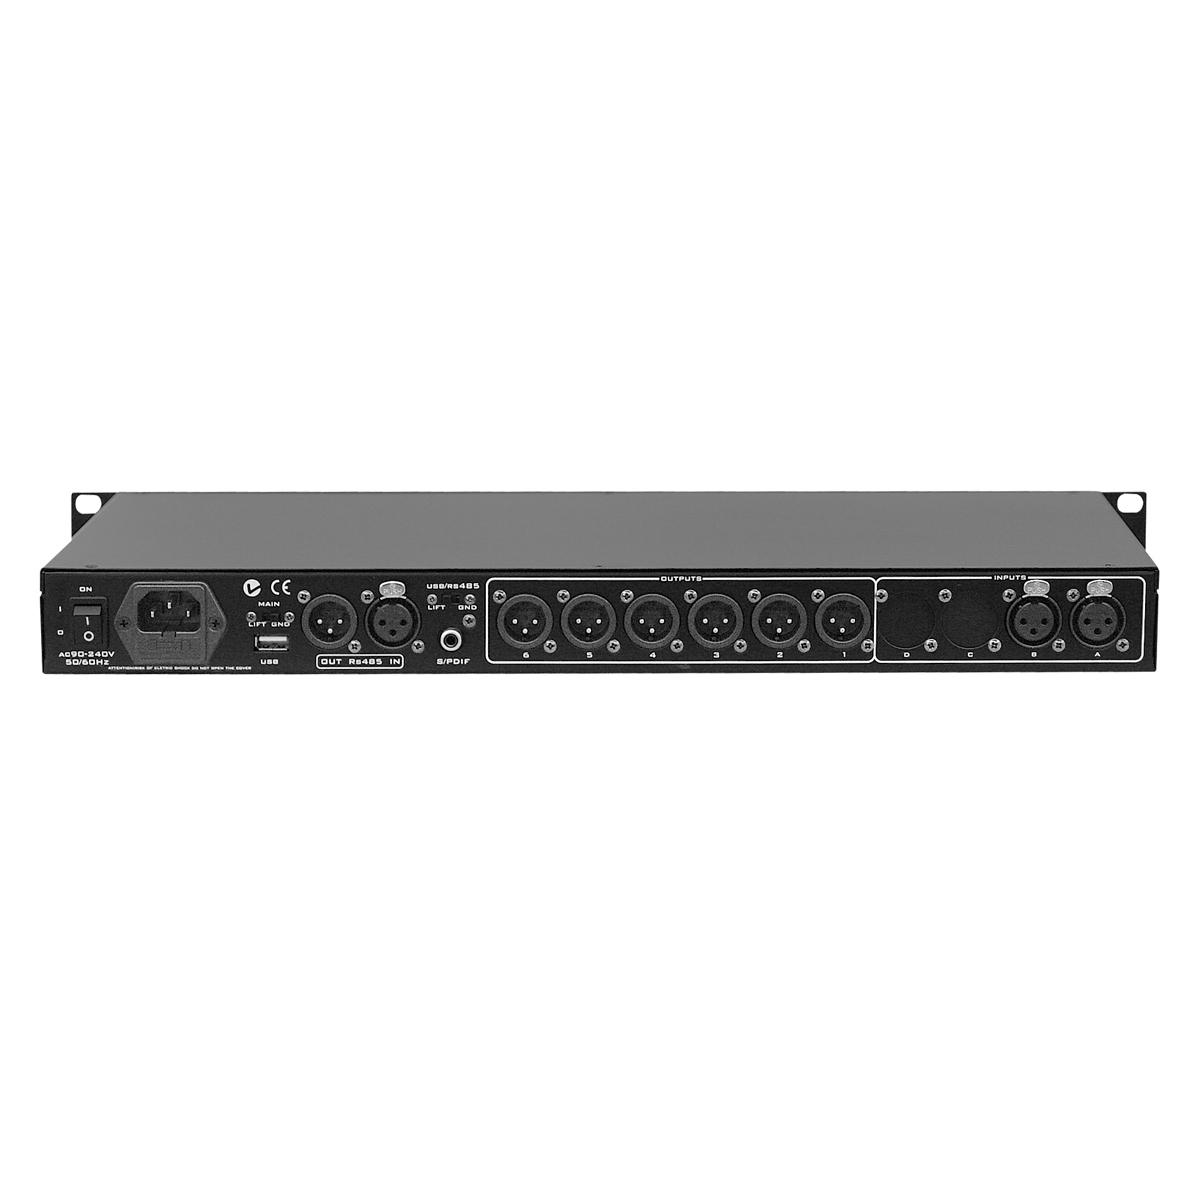 ODP260 - Processador de Áudio ODP 260 - Oneal